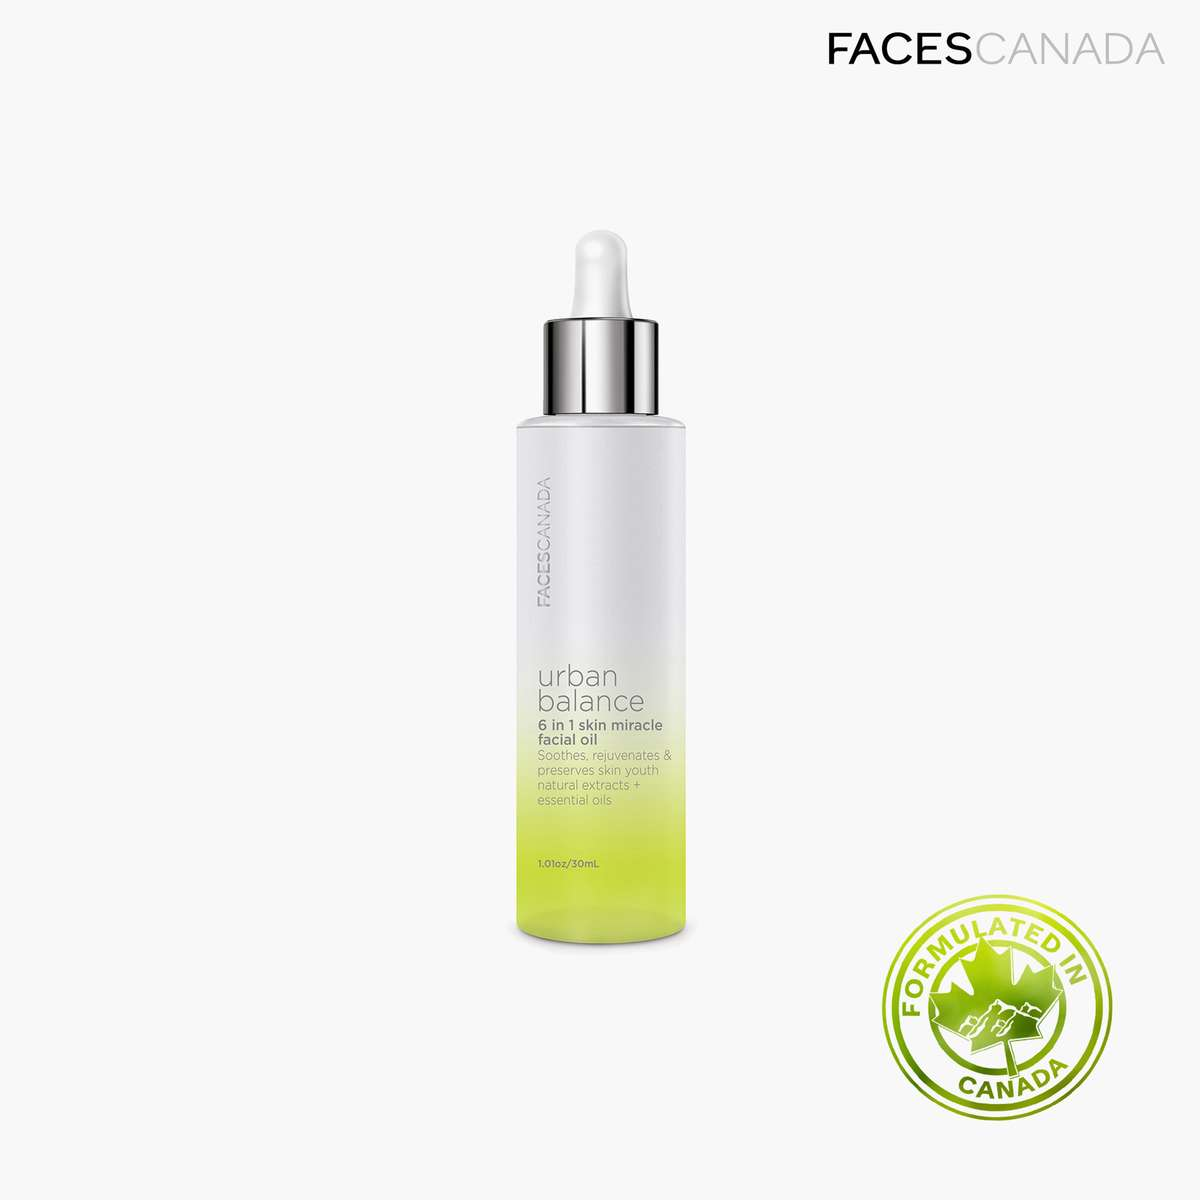 3.FACES CANADA Urban Balance 6 in 1 Skin Miracle Facial Oil